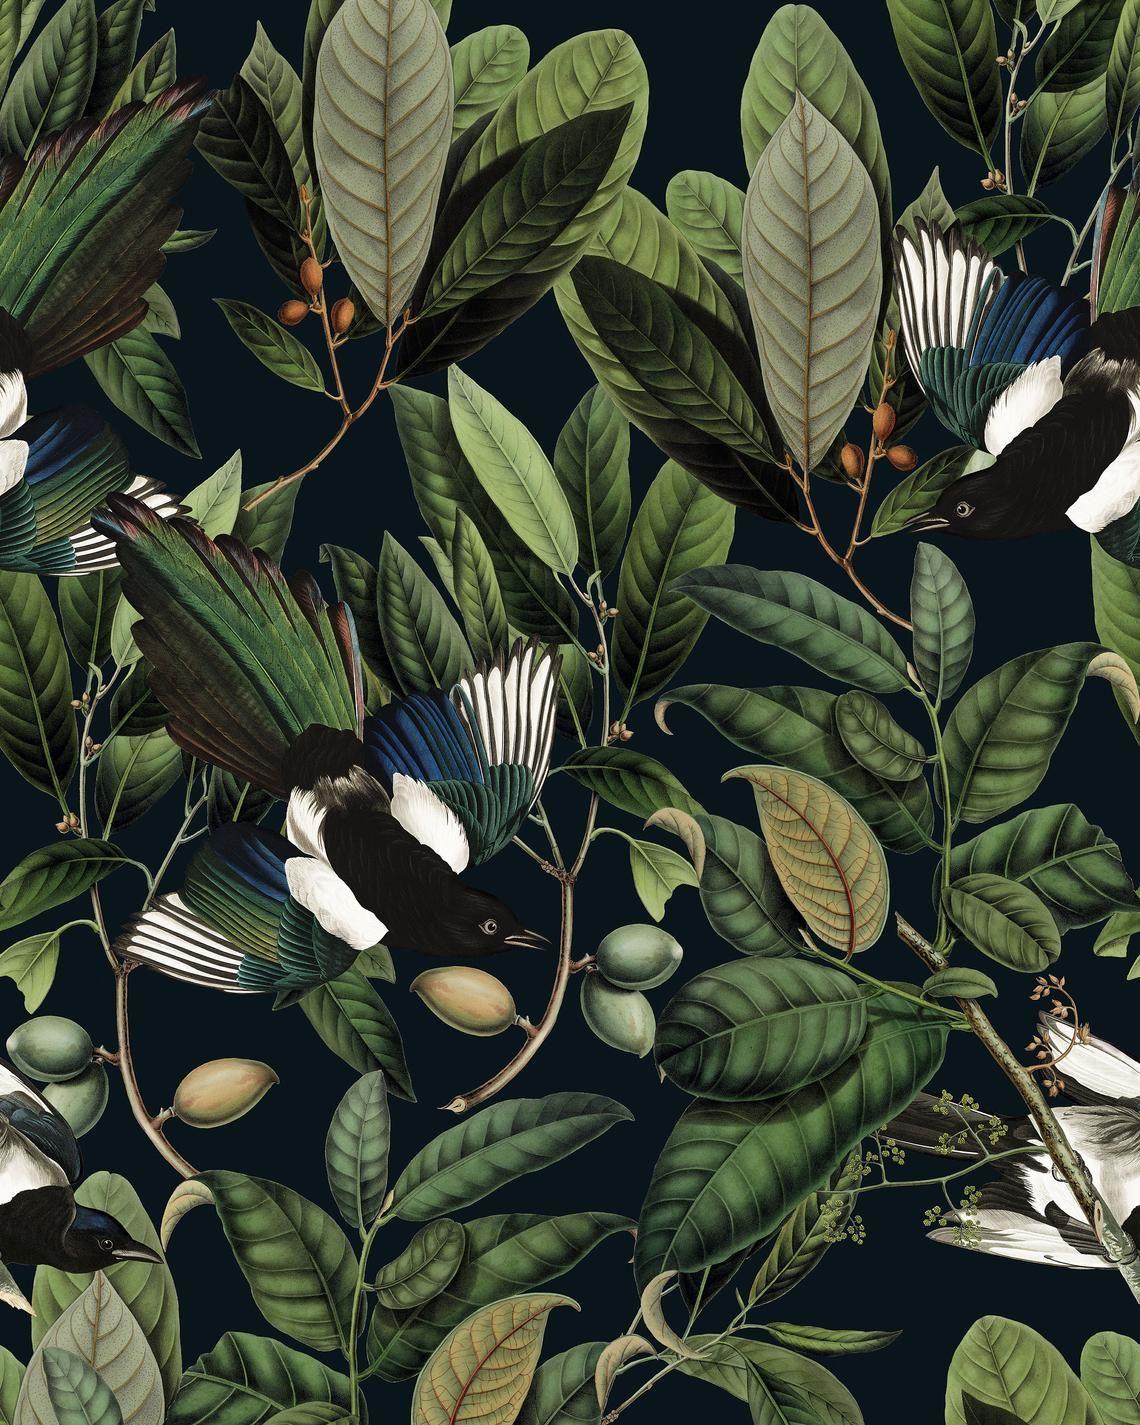 Dark Vintage Wallpaper 1140x1425 Download Hd Wallpaper Wallpapertip